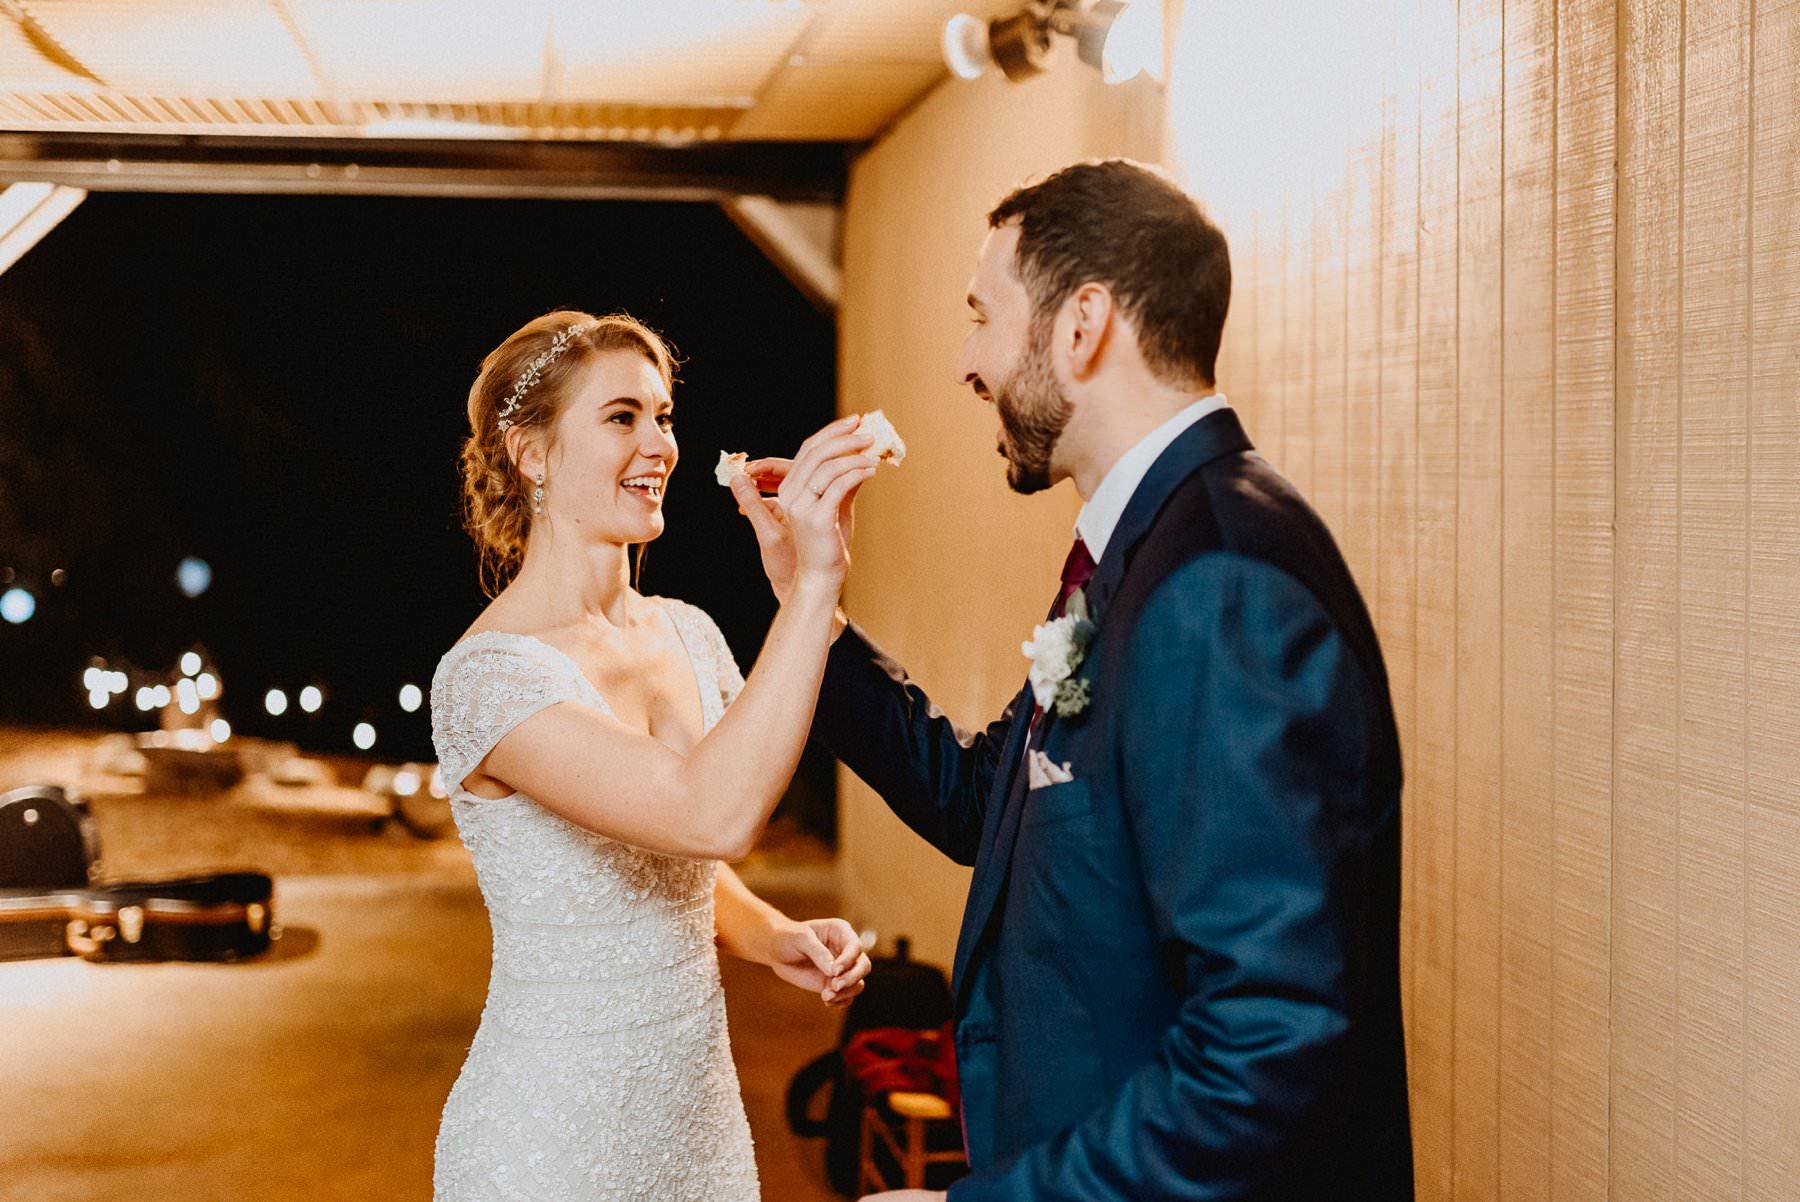 John_James_Audubon_Center_wedding-79.jpg